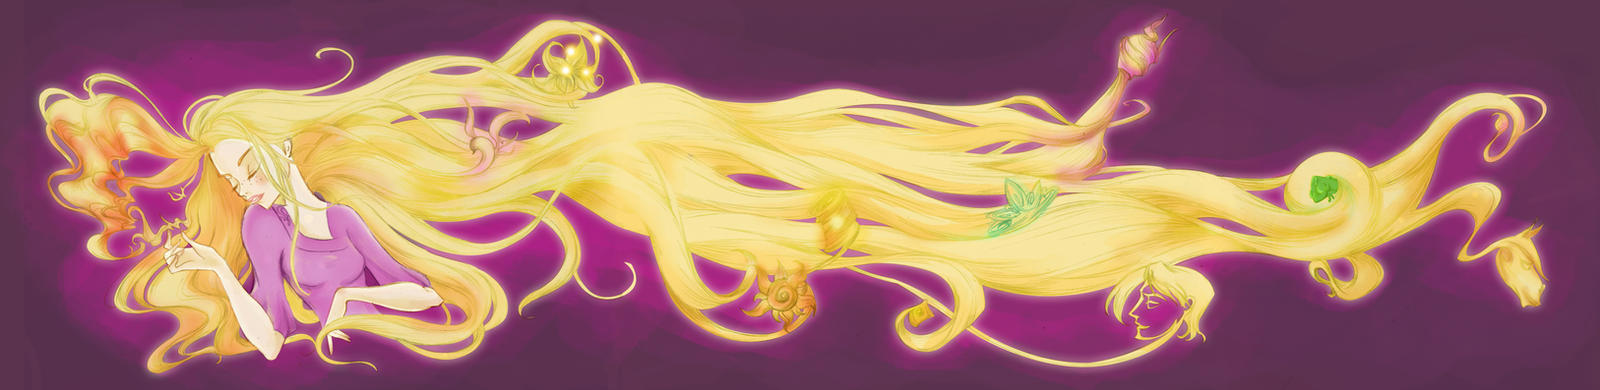 Rapunzel's Dream by MadEye01